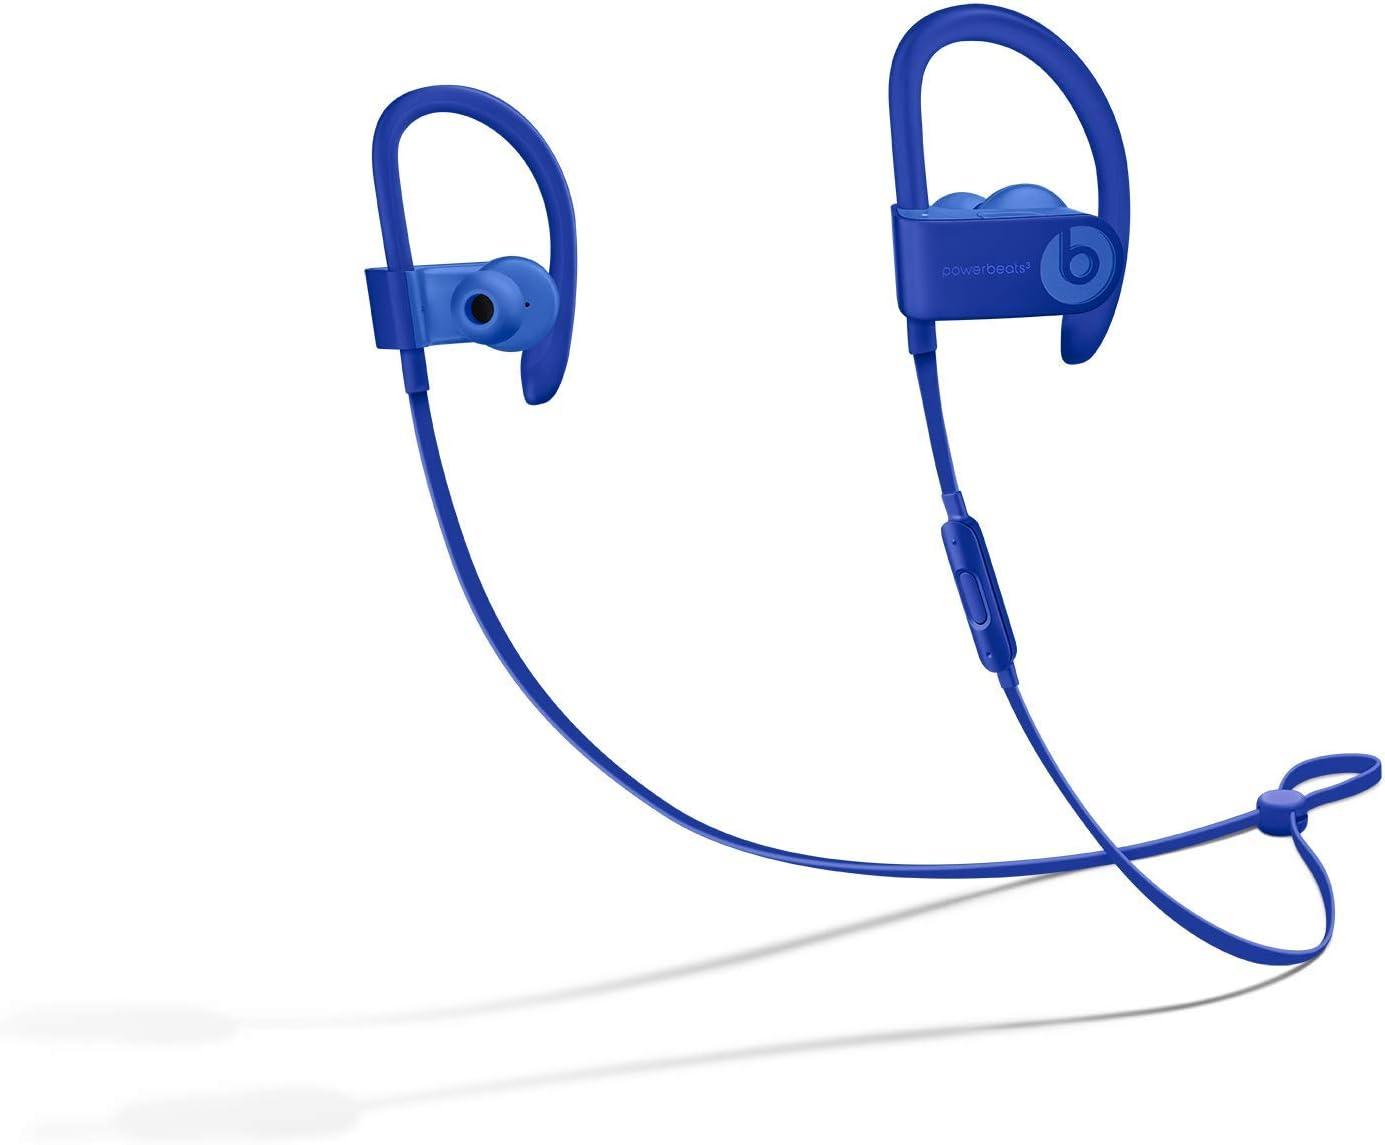 Powerbeats3 Wireless Earphones Apple W1 Headphone Chip Class 1 Bluetooth 12 Hours Of Listening Time Sweat Resistant Earbuds Break Blue Amazon Ca Electronics